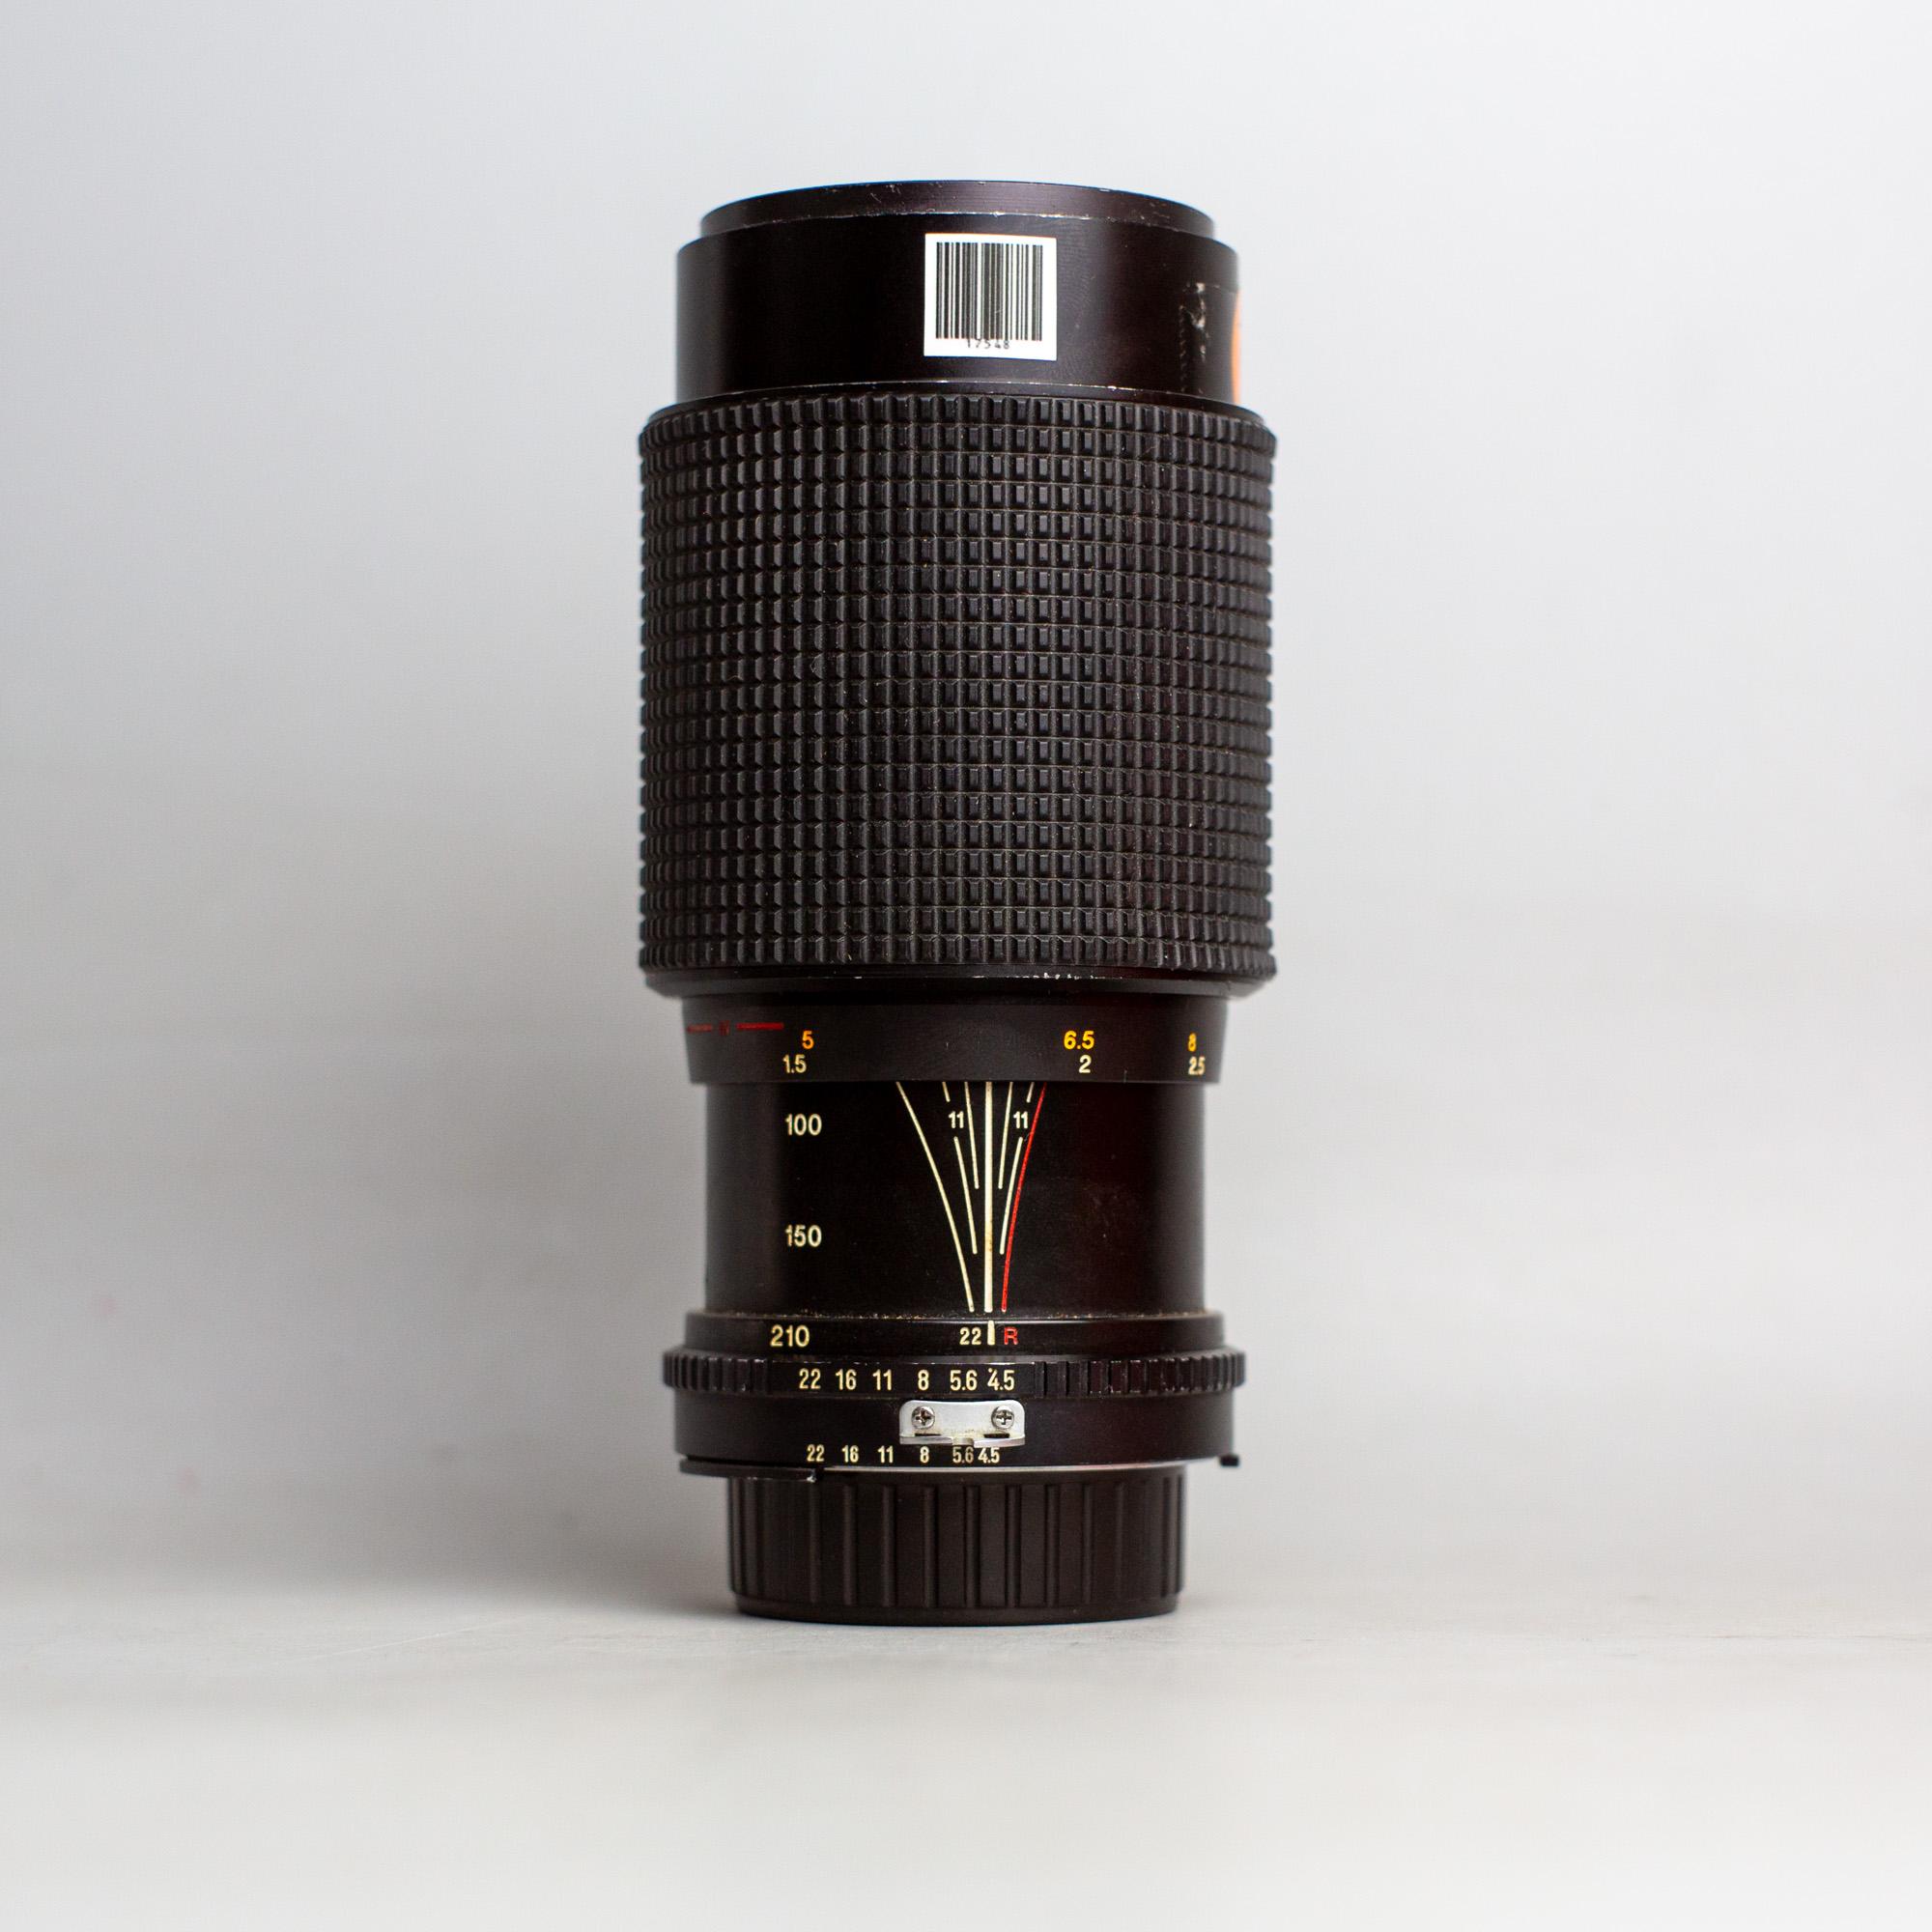 tokina-70-210mm-f4-5-mf-nikon-tokina-70-210-4-5-17548